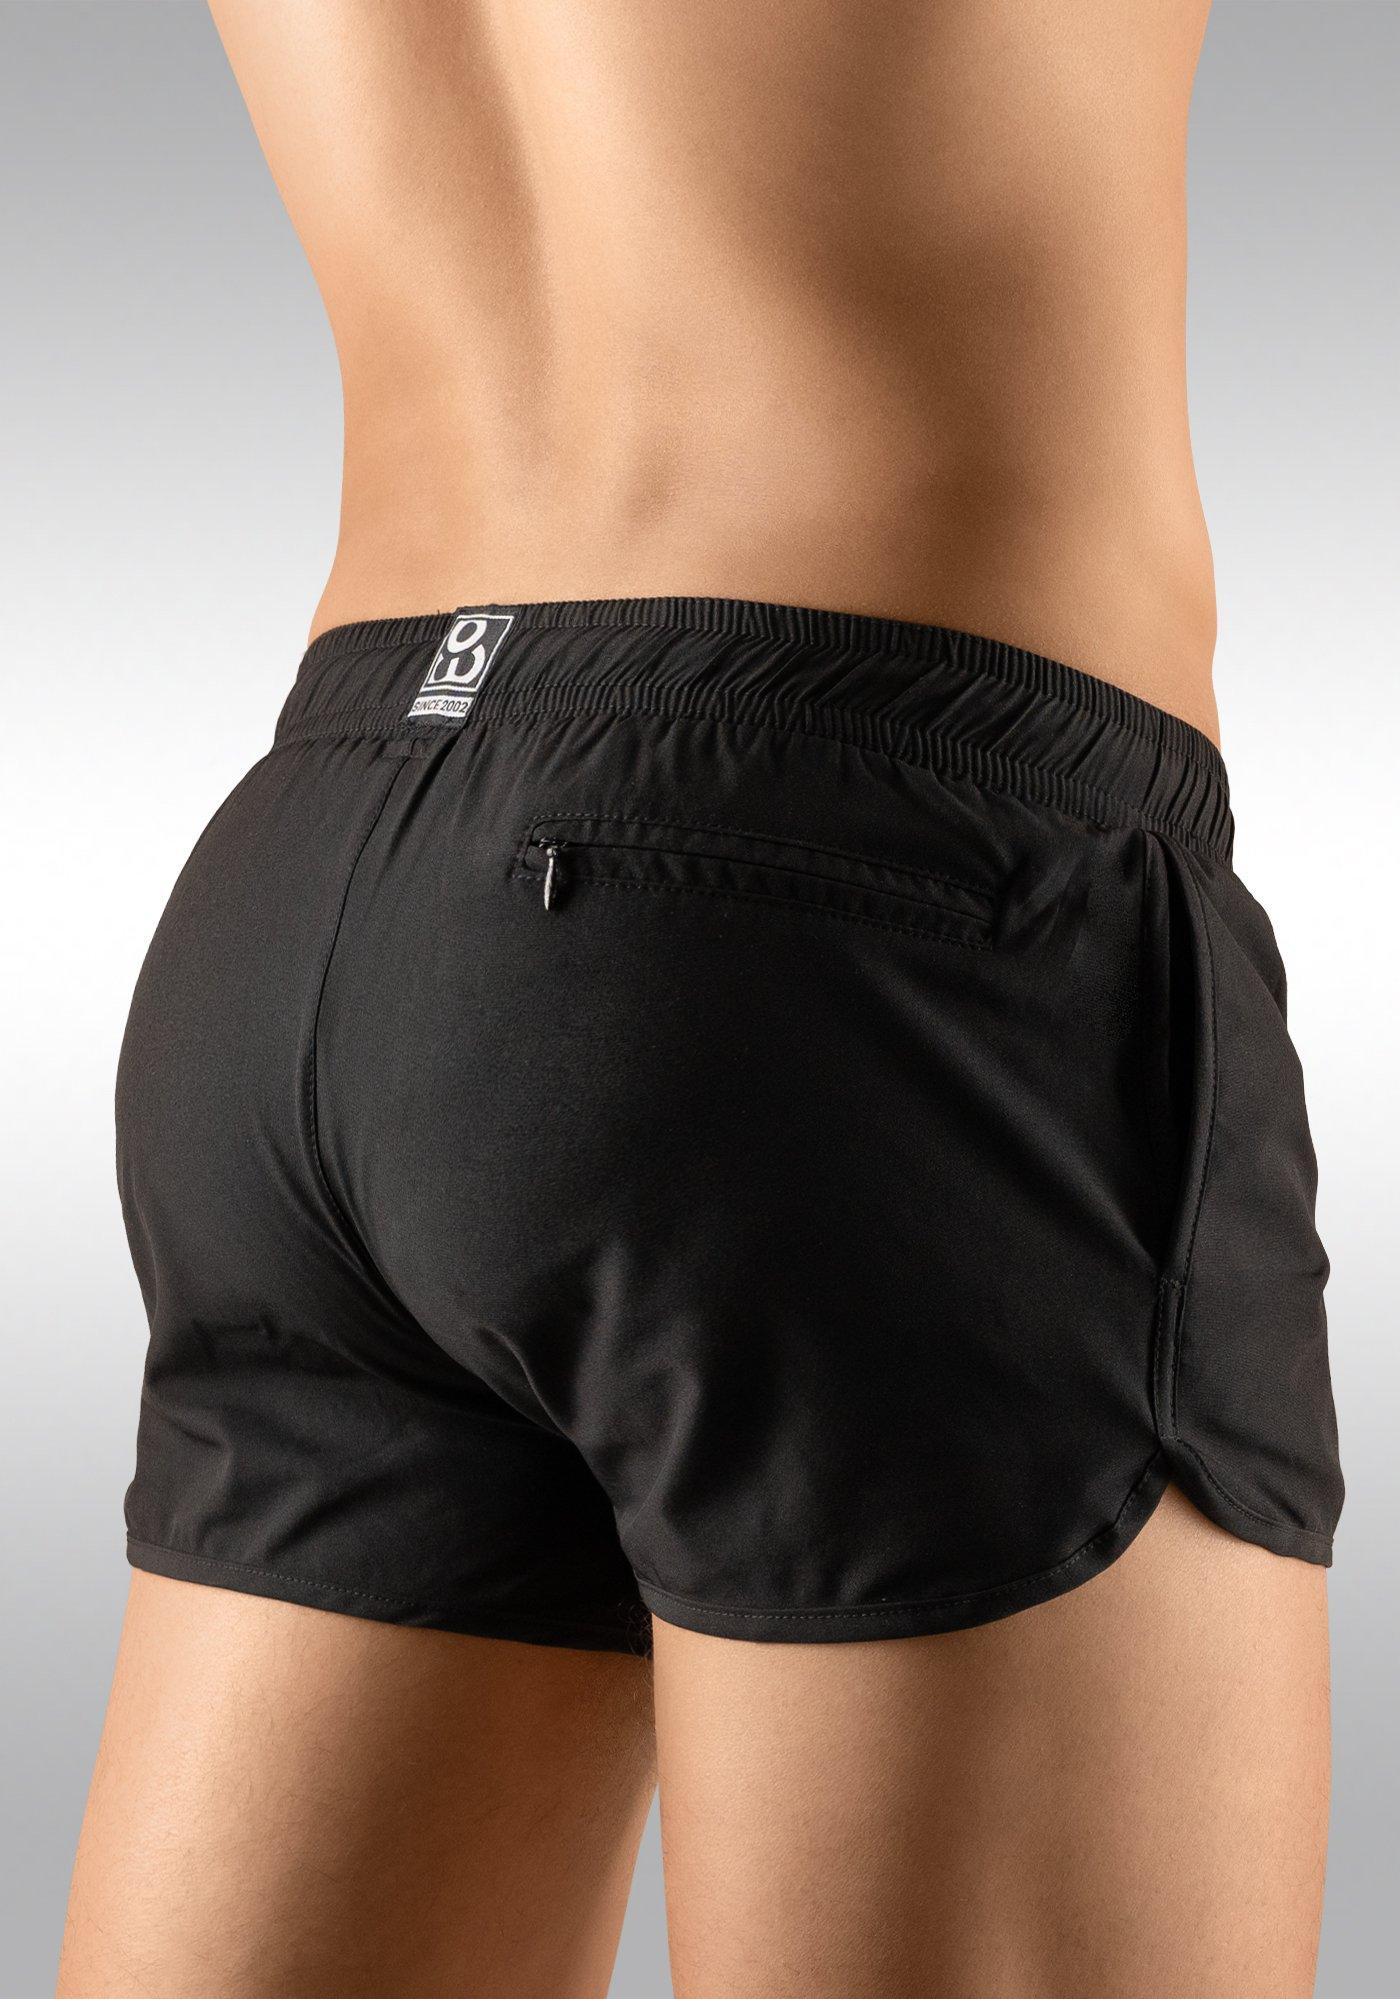 Men's Gym Short Black Rear View - Ergowear